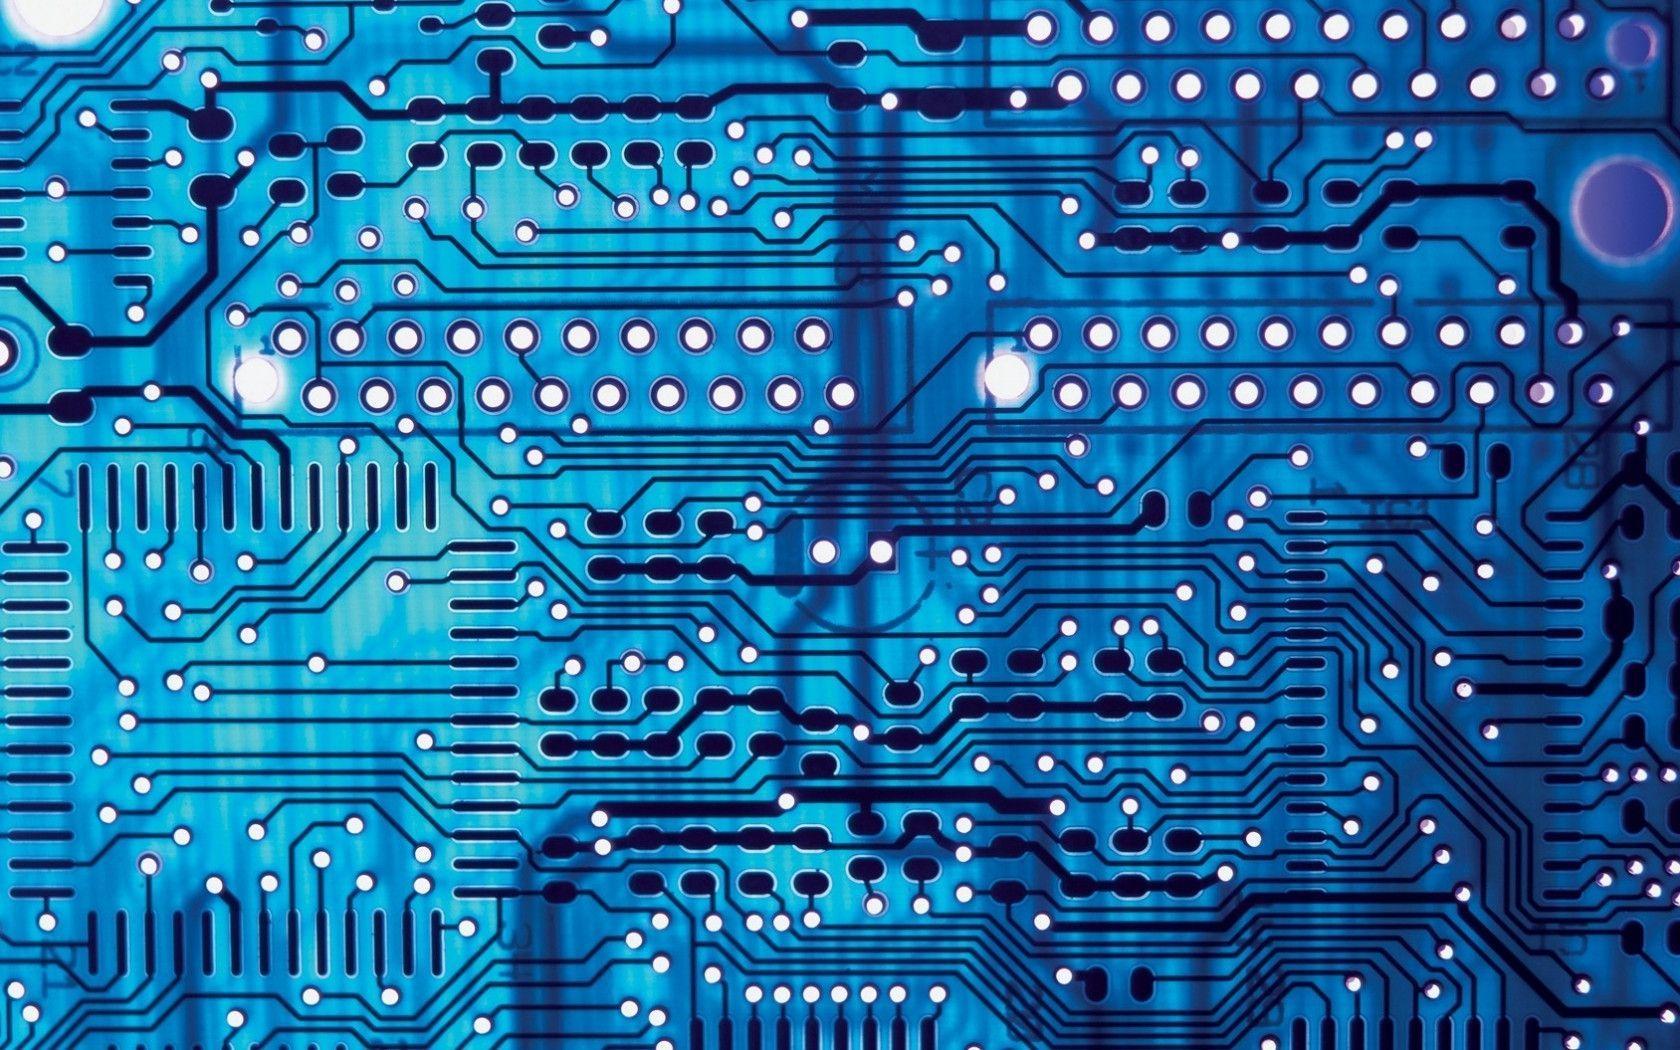 Electronic Circuit Wallpaper 1680x1050